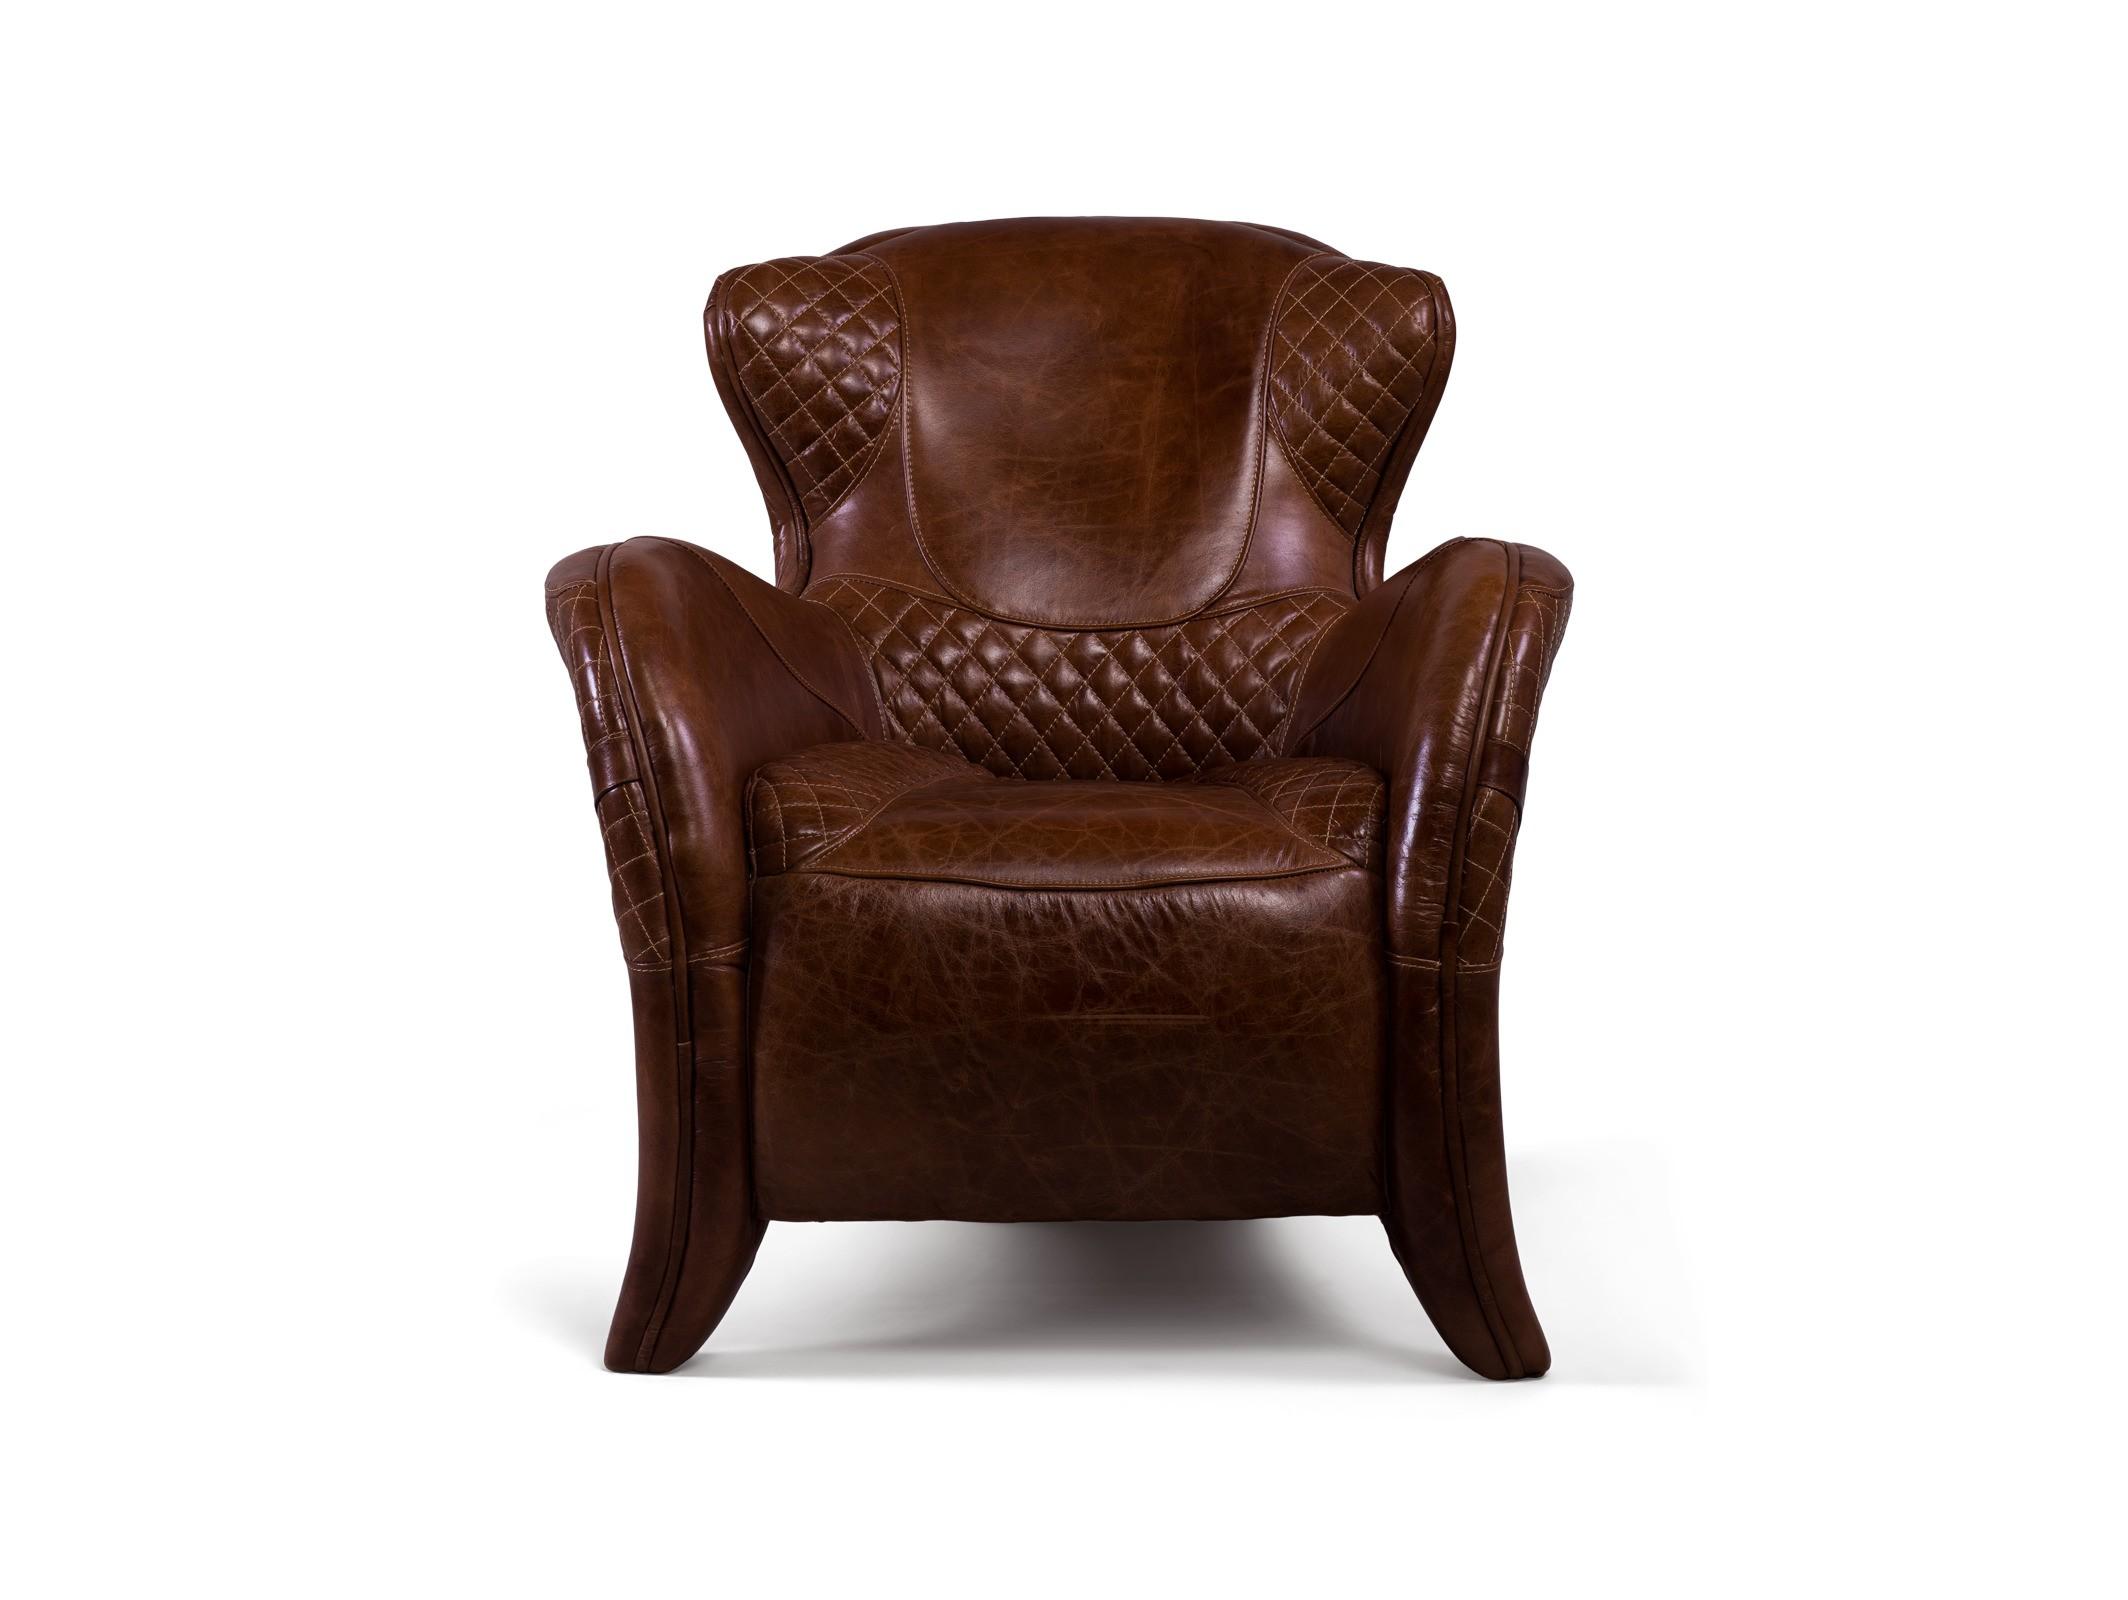 Кресло Saddle Easy ChairИнтерьерные кресла<br><br><br>Material: Кожа<br>Ширина см: 80<br>Высота см: 84<br>Глубина см: 92